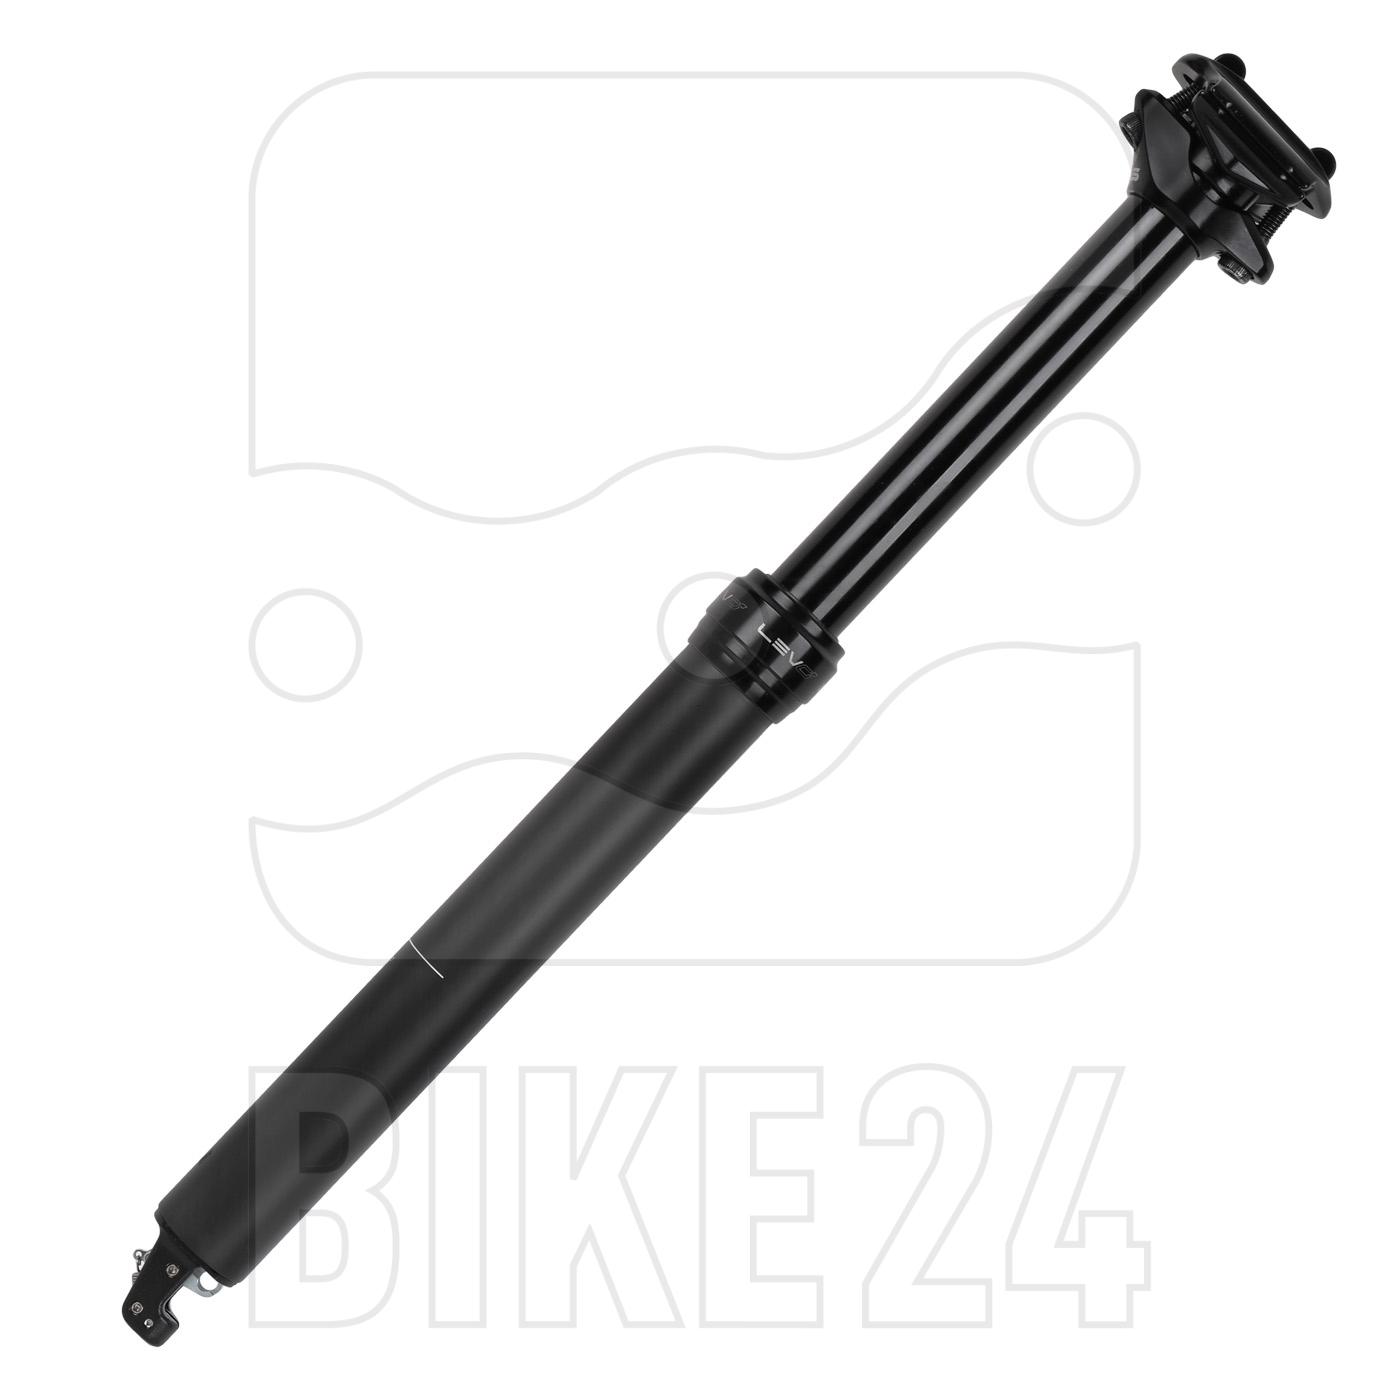 Picture of KS LEV CI 31.6 Remote Carbon Dropper Seatpost - 390mm I Range: 125mm